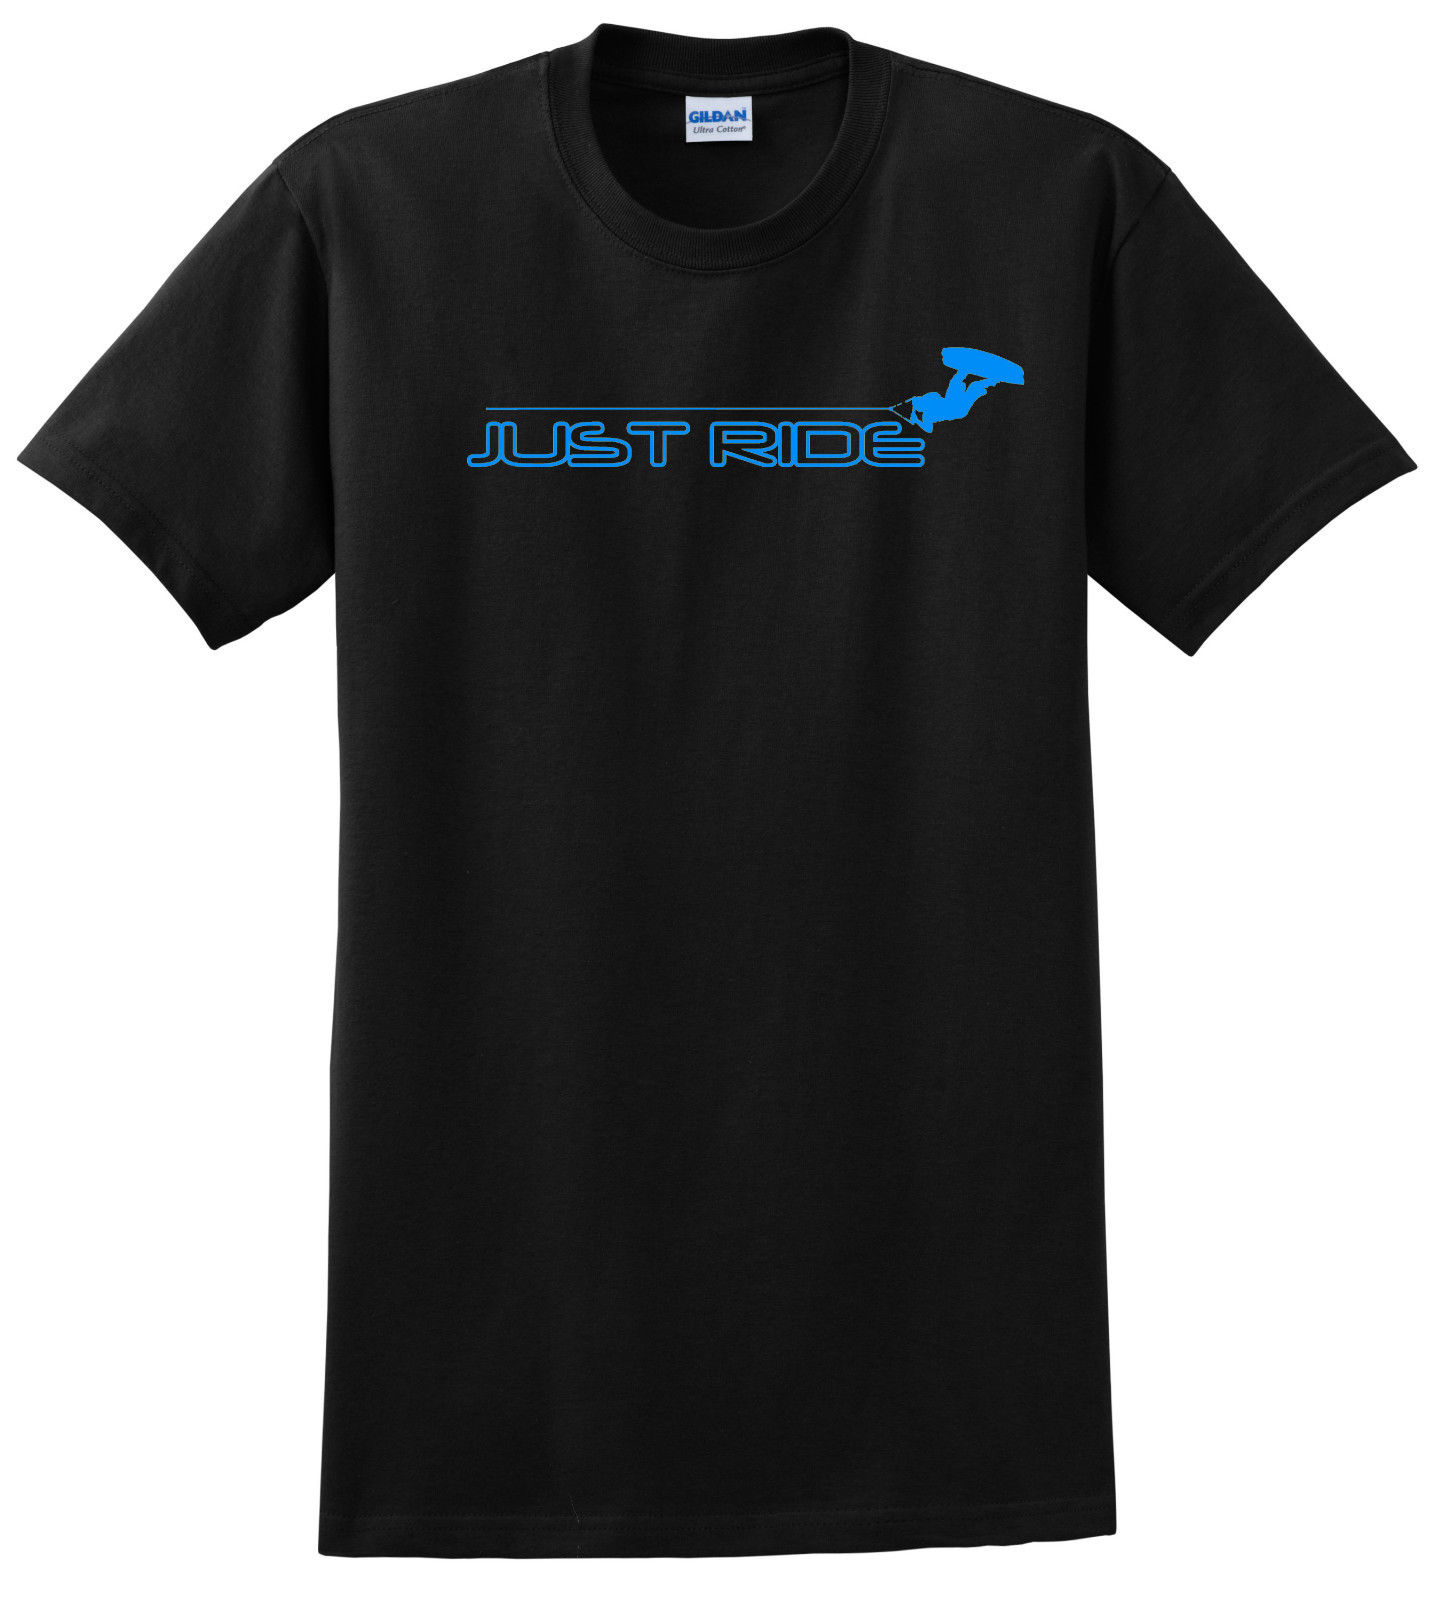 2019 venda quente moda apenas passeio wake board t camisa surfs skate barco ronix força líquida hyperlite cwb 4 t camisa